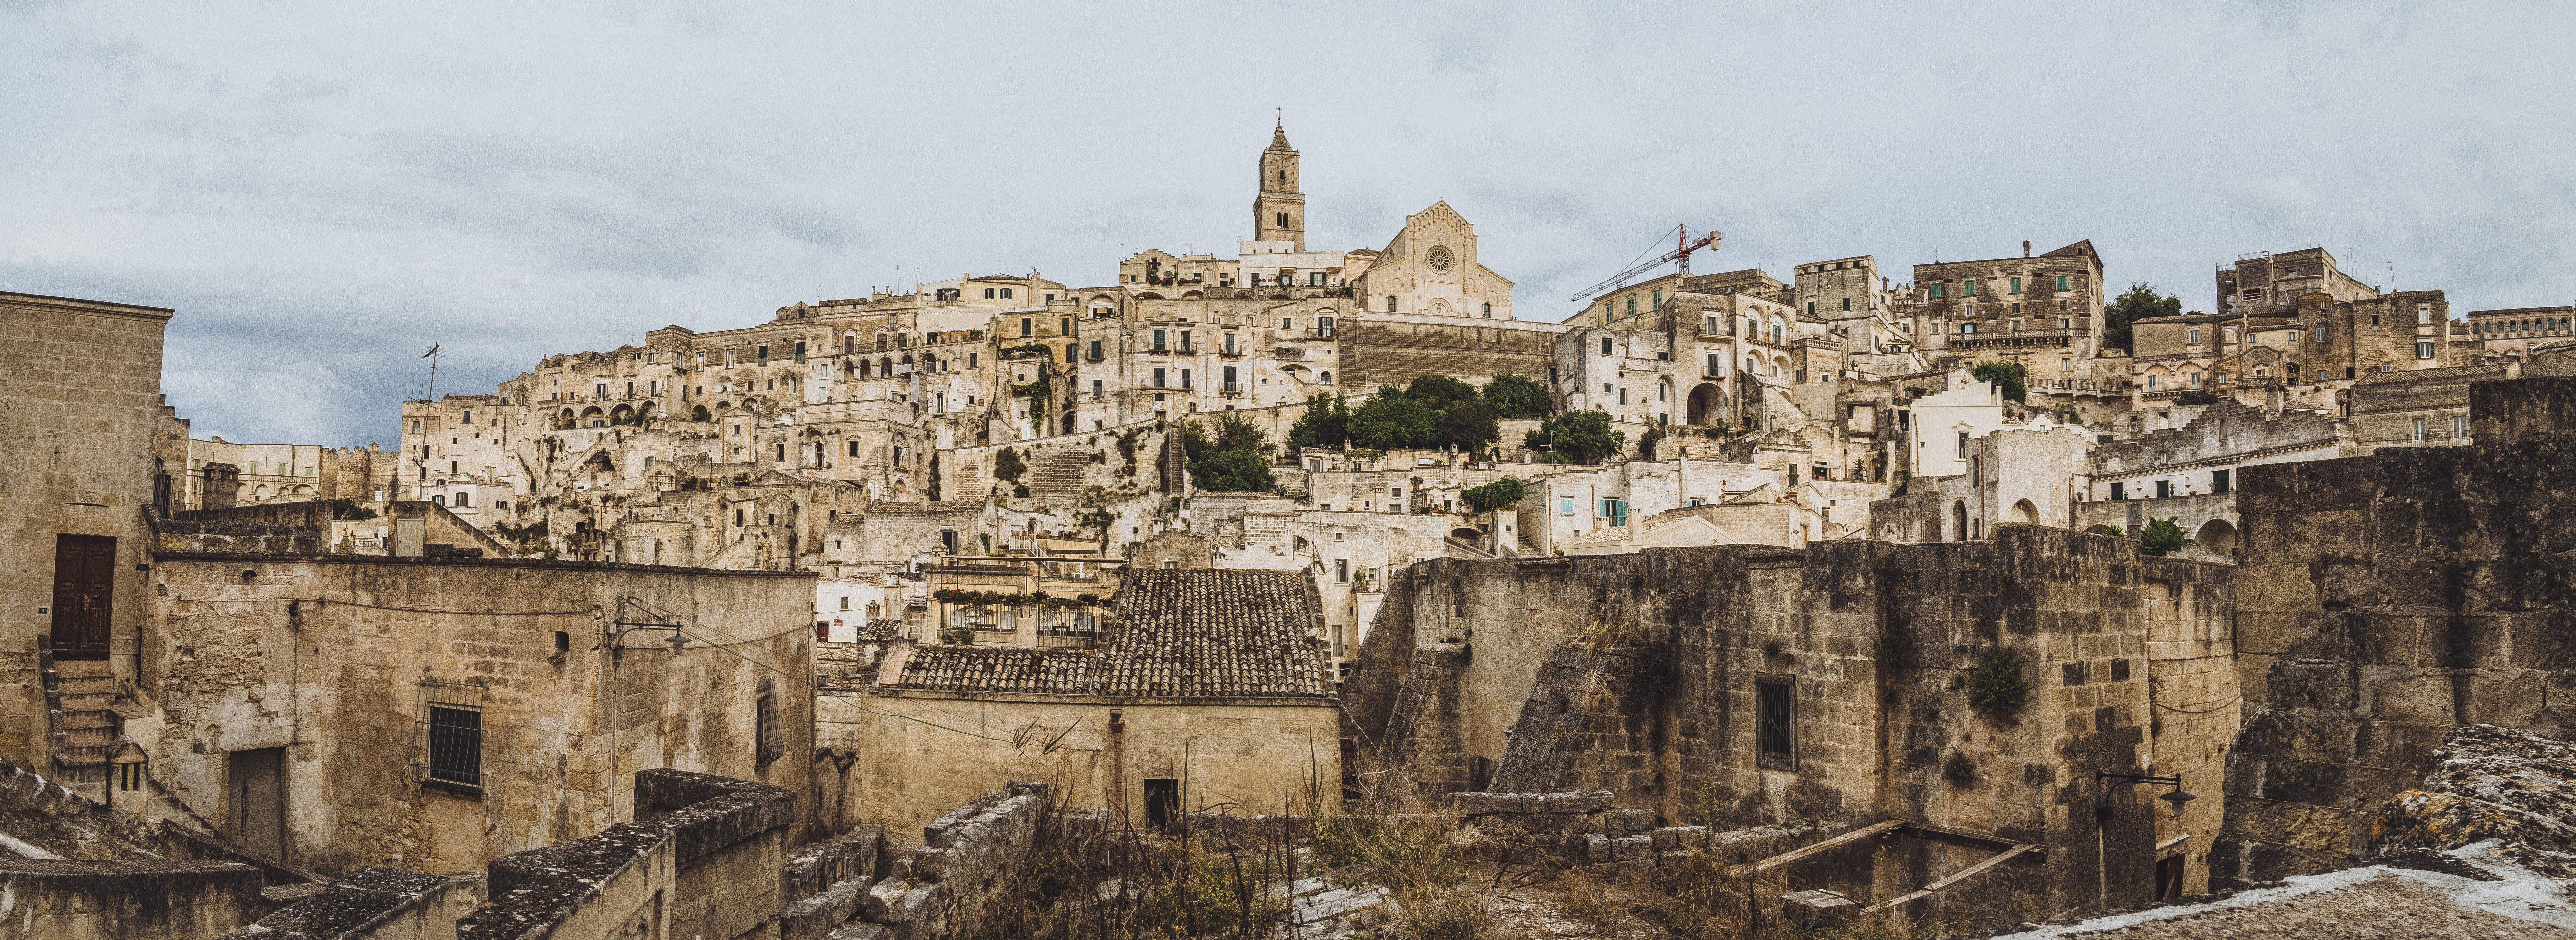 Matera, Italy - honeymoon planning 2019